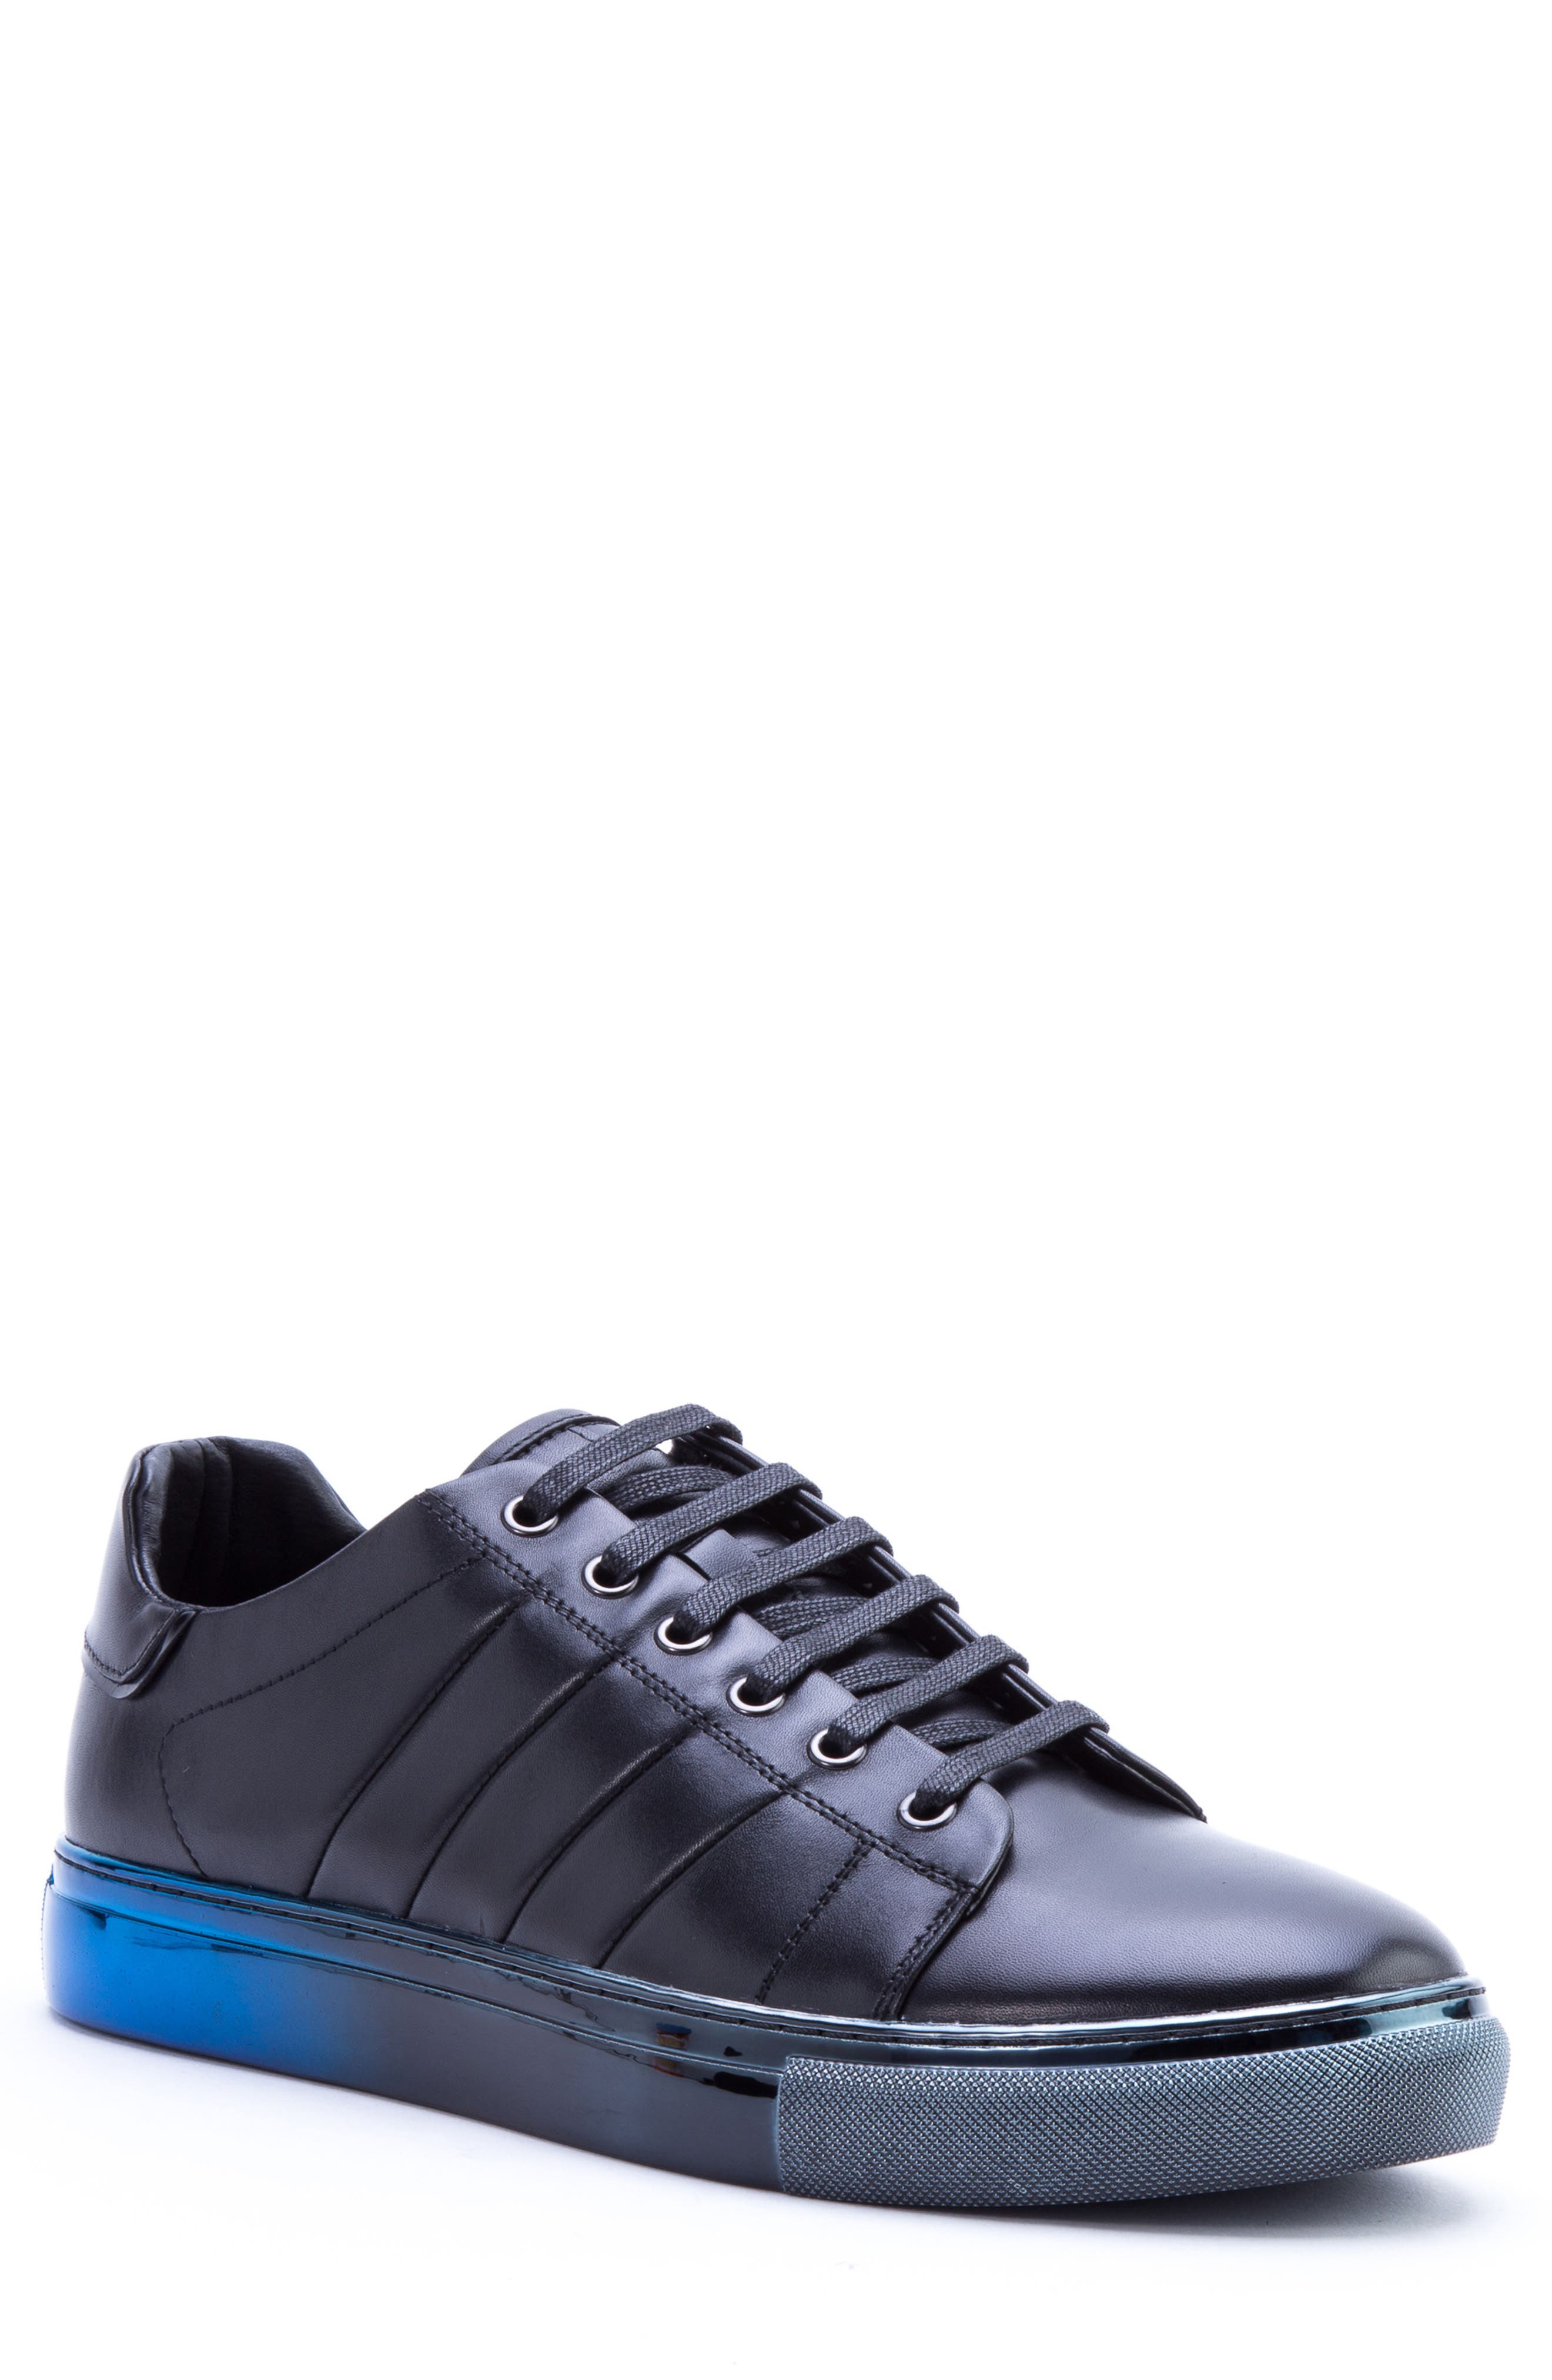 BADGLEY MISCHKA COLLECTION Badgley Mischka Brando Sneaker, Main, color, BLACK LEATHER